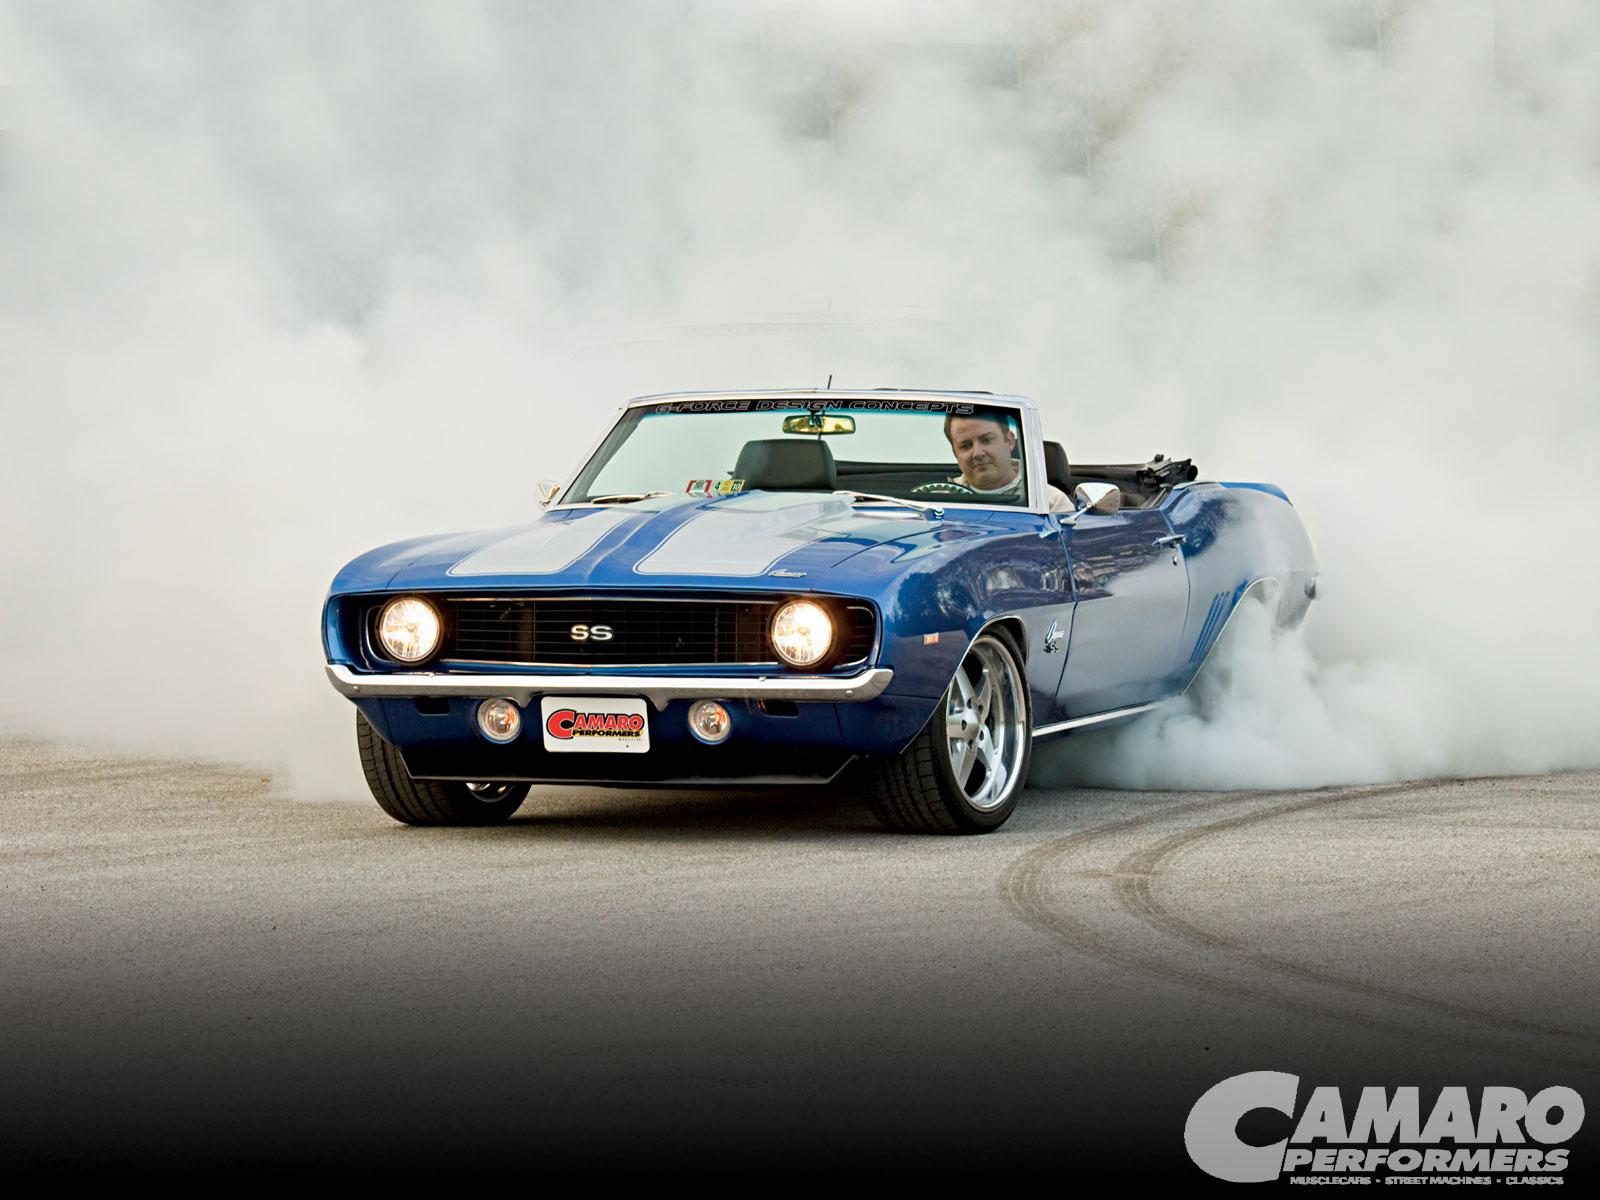 [50+] Camaro Burnout Wallpaper on WallpaperSafari